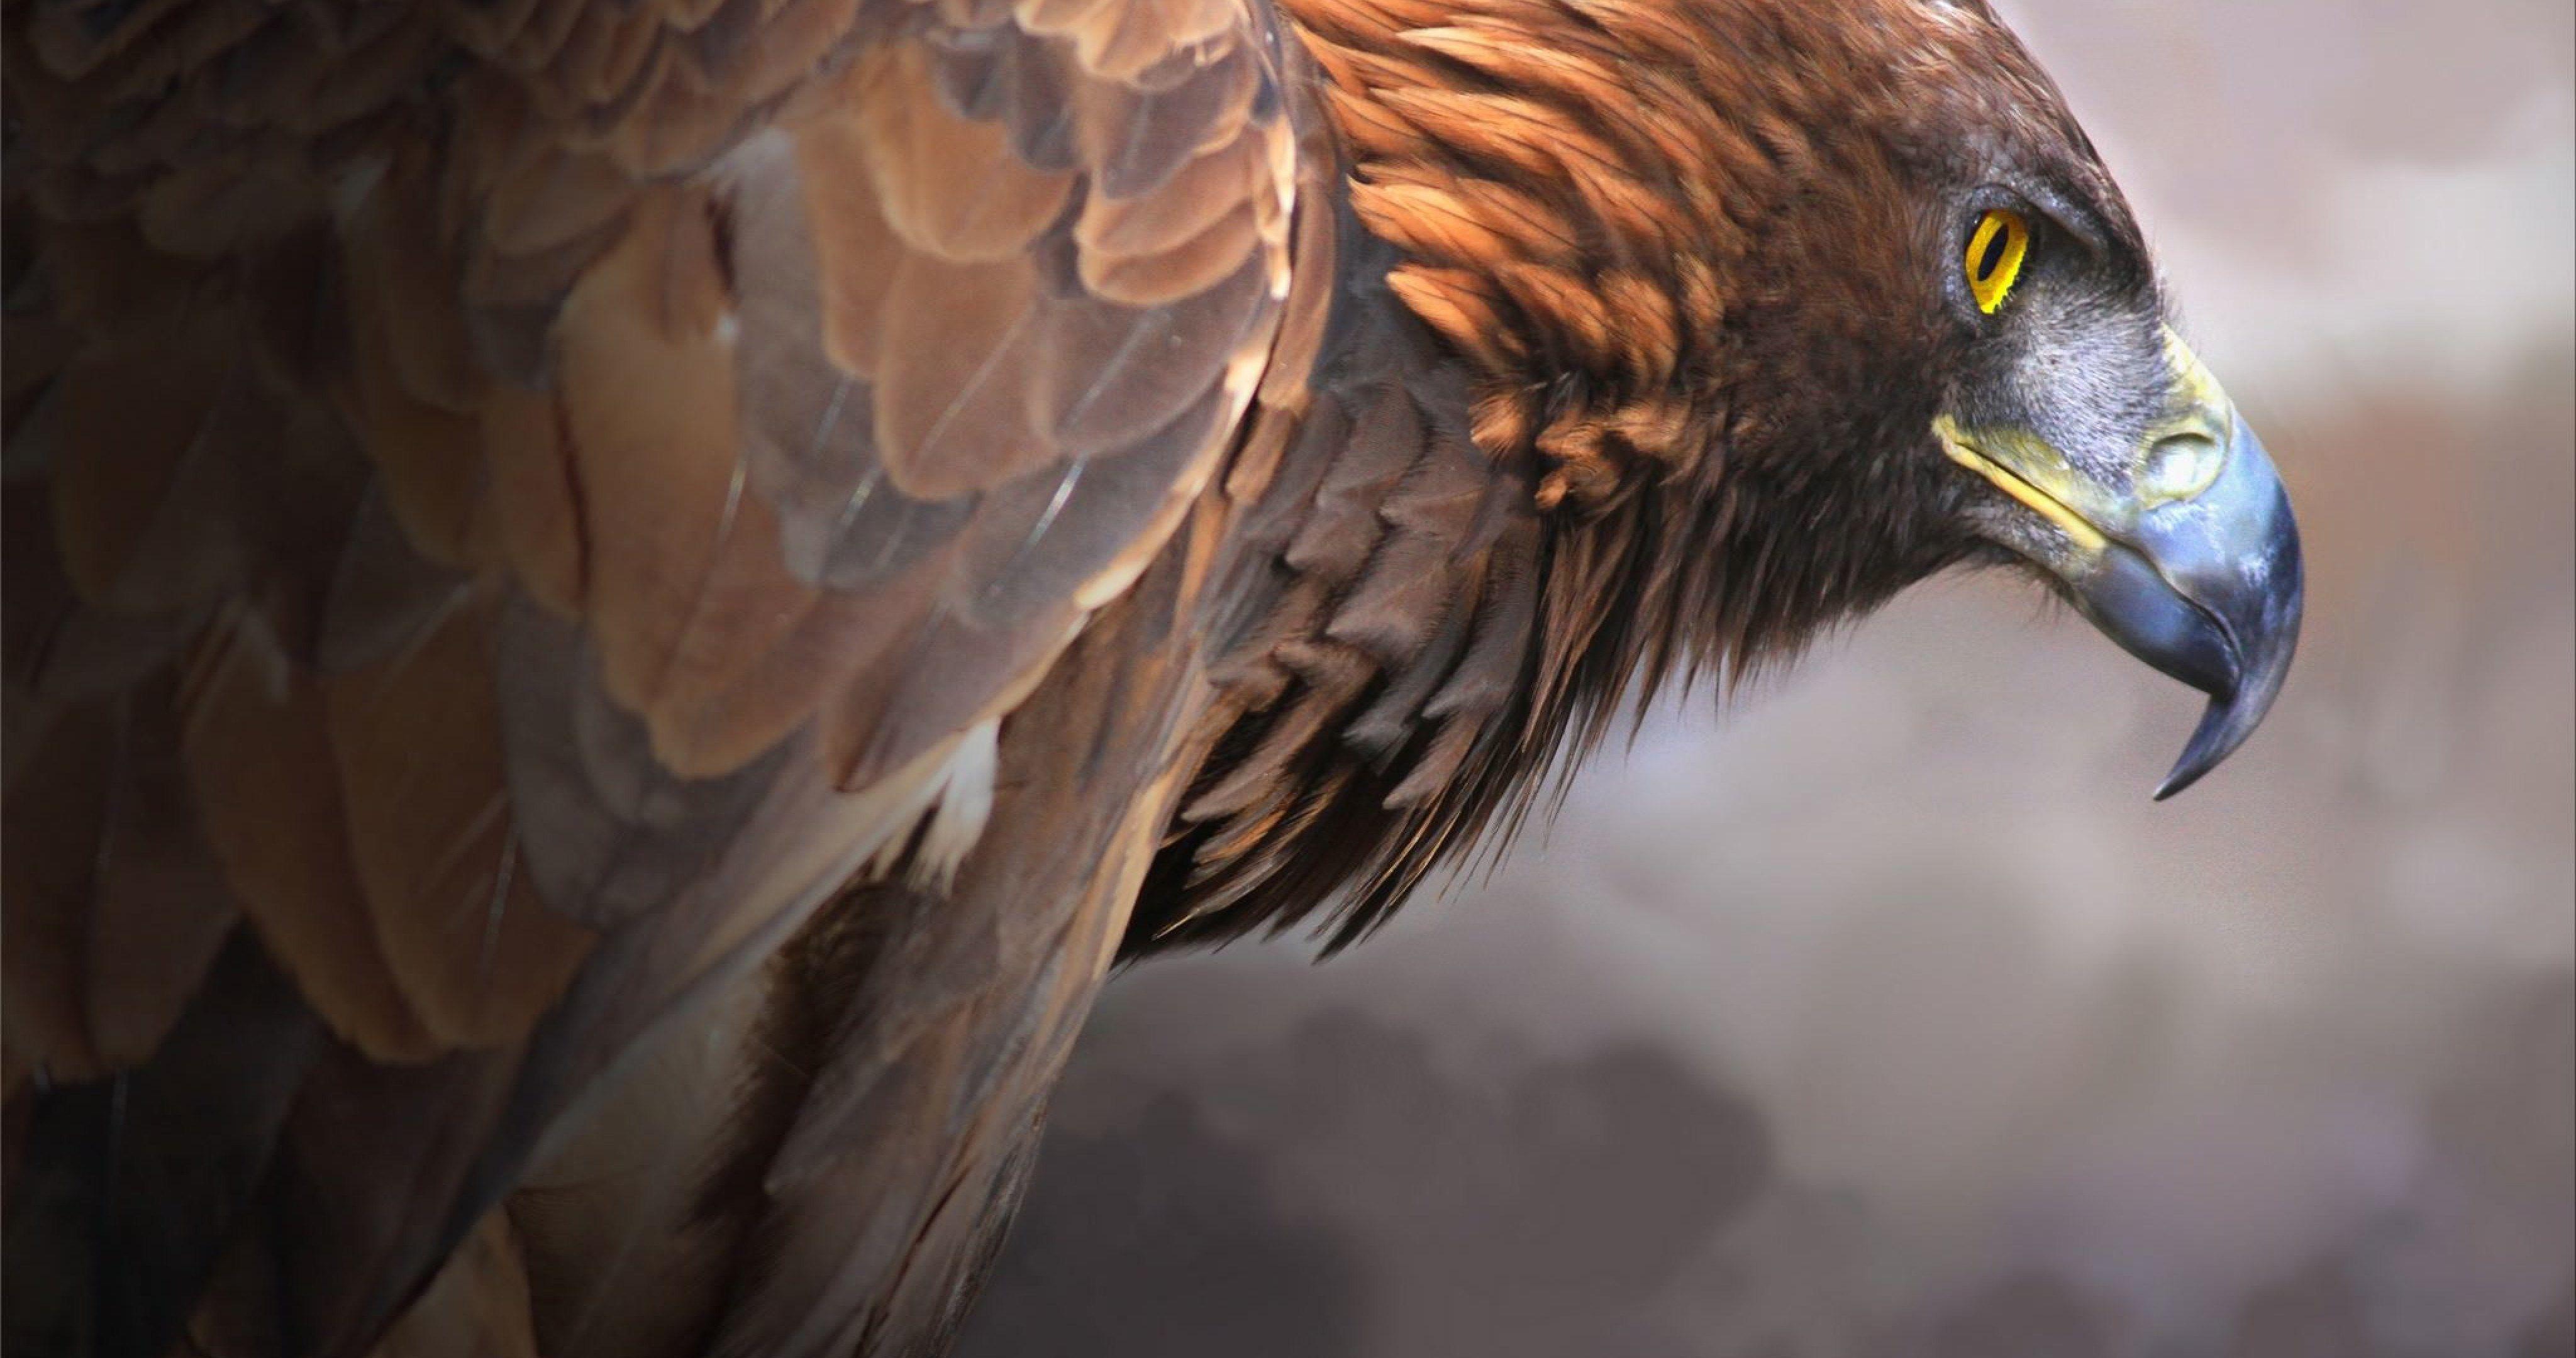 Hd wallpaper eagle - Golden Eagle Bird 4k Ultra Hd Wallpaper